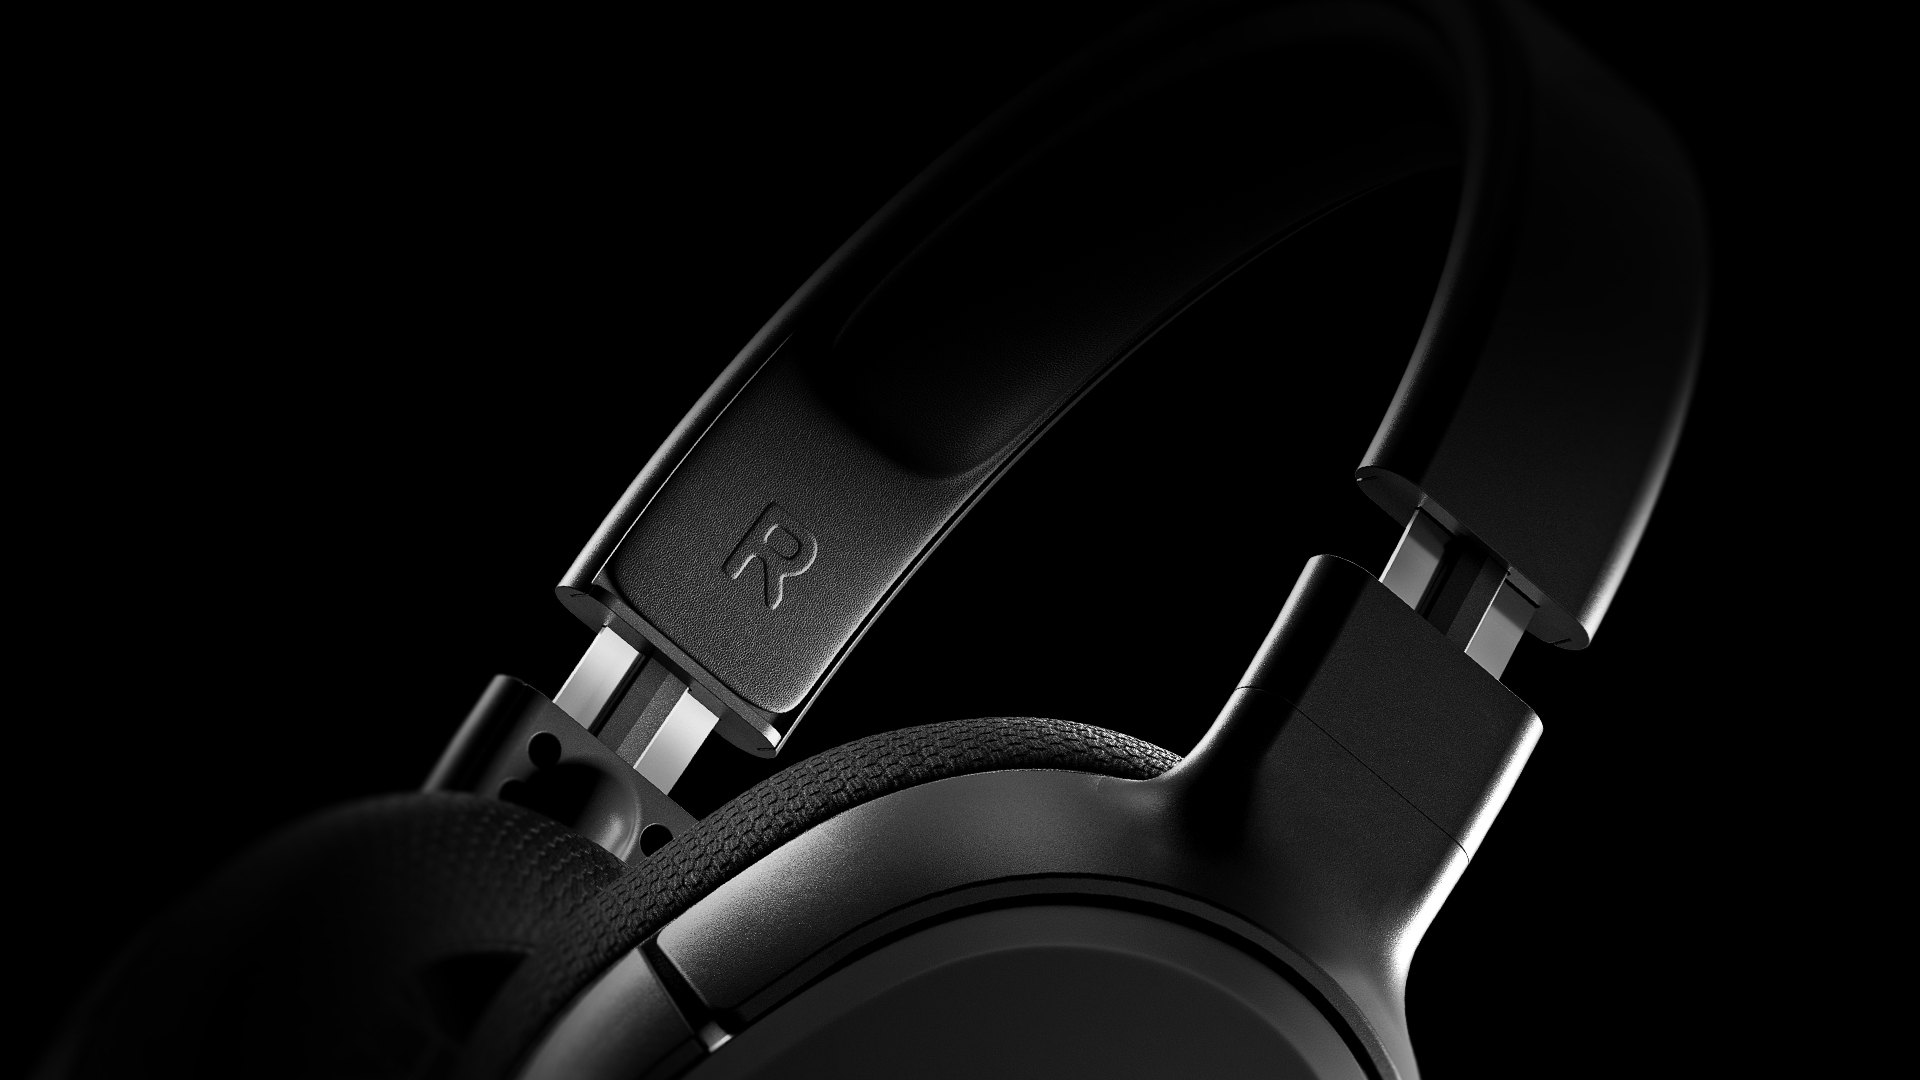 Tai nghe SteelSeries Arctis 1 61427 có thiết kế headband chắc chắn